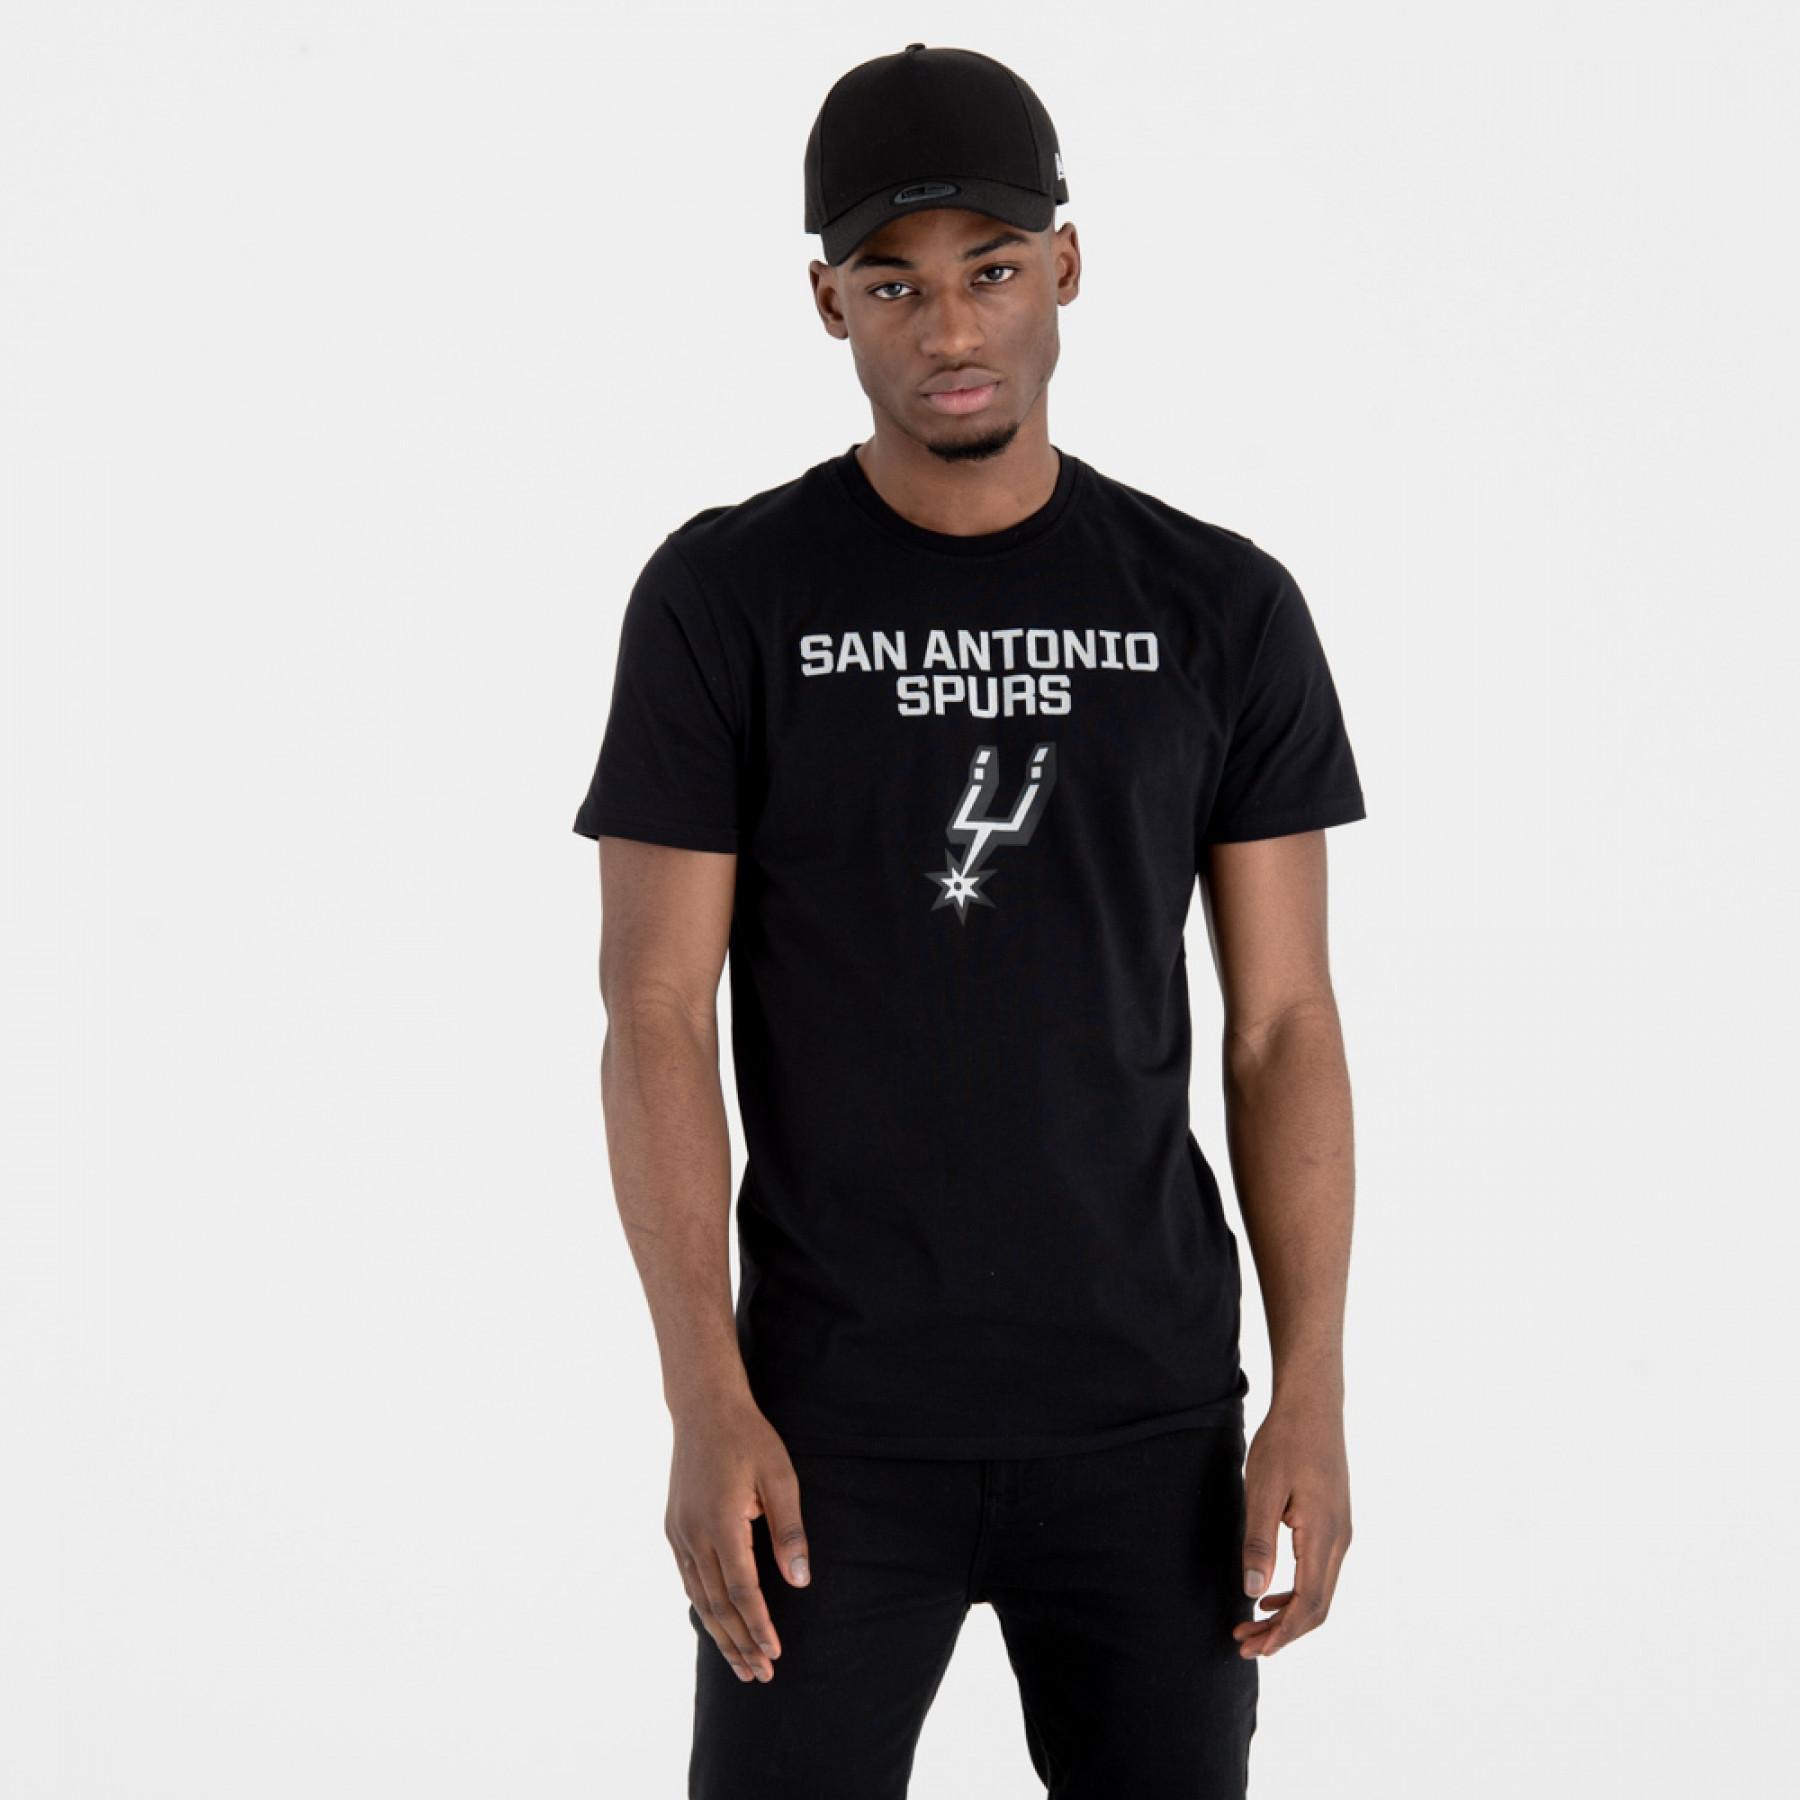 New EraT - s h i r t   logo San Antonio Spurs